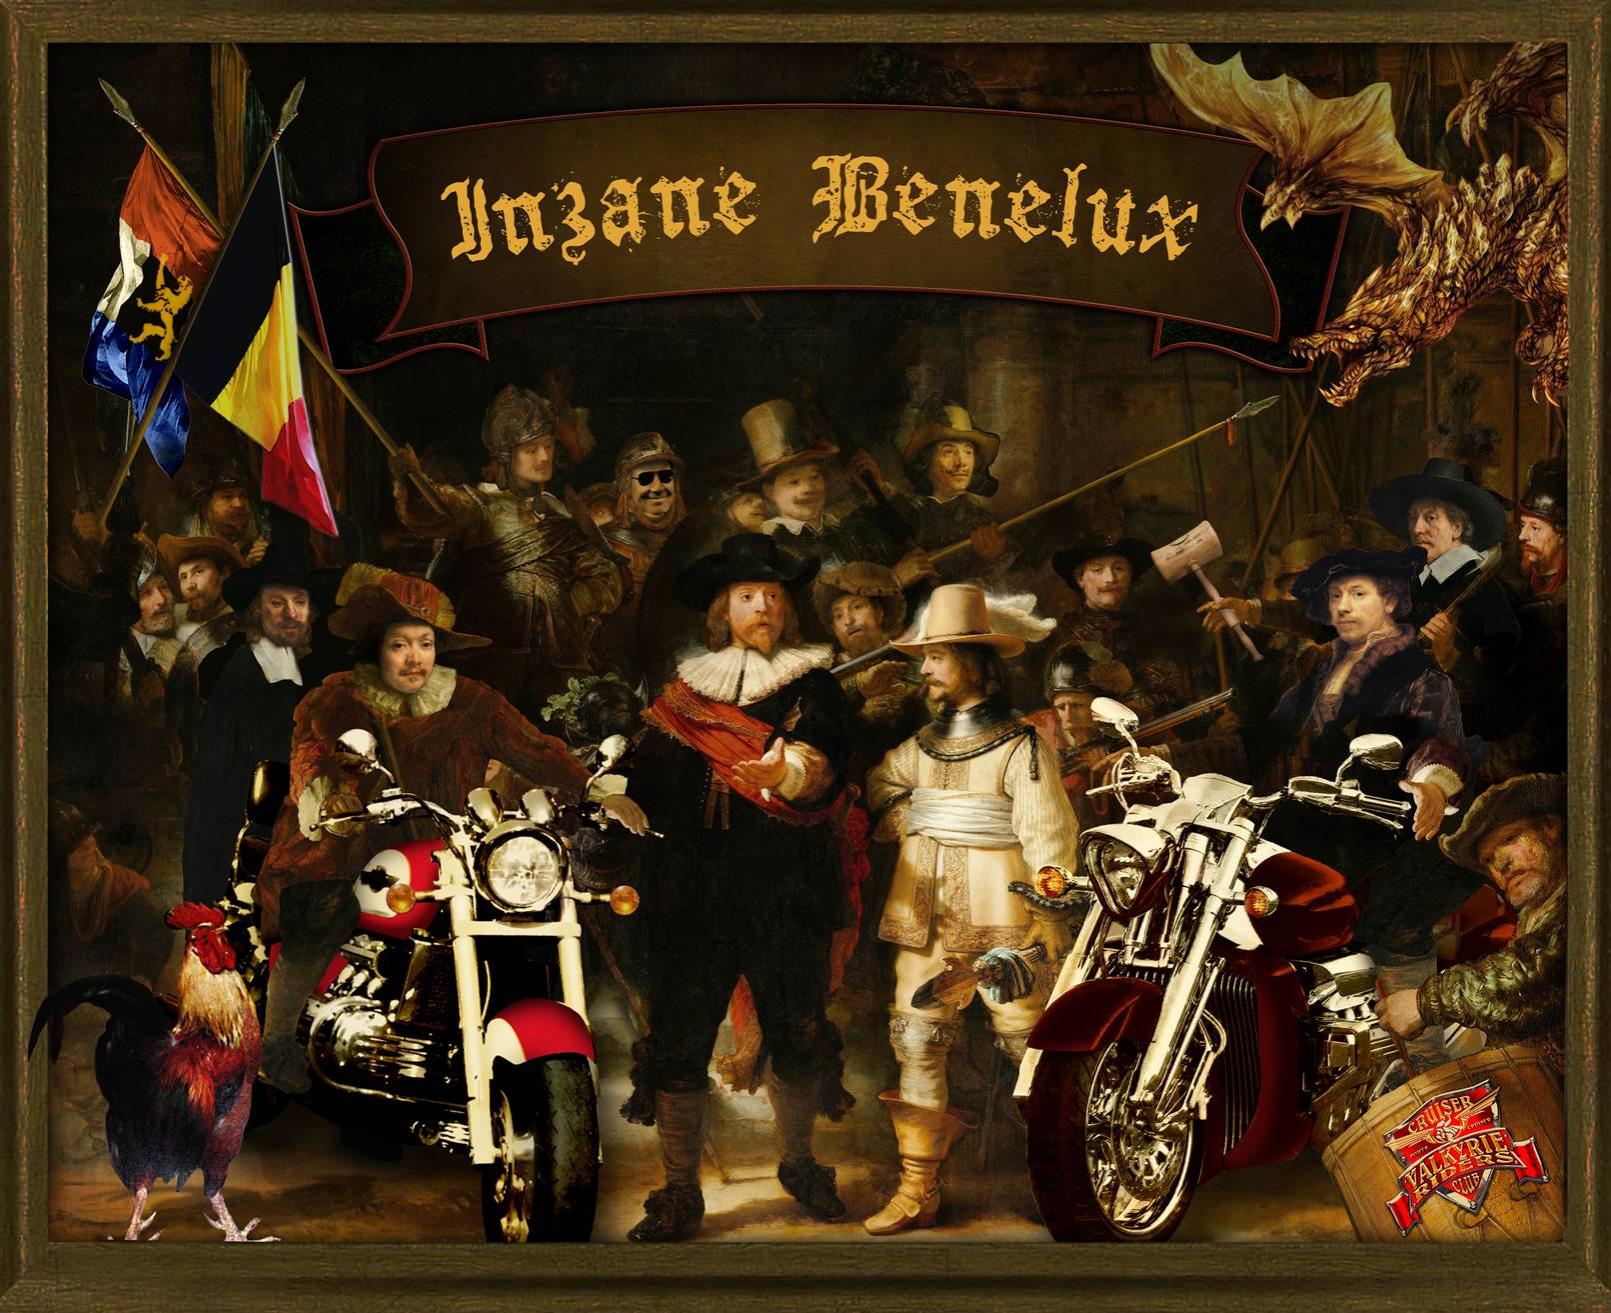 INZANE X – 2015 - BENELUX